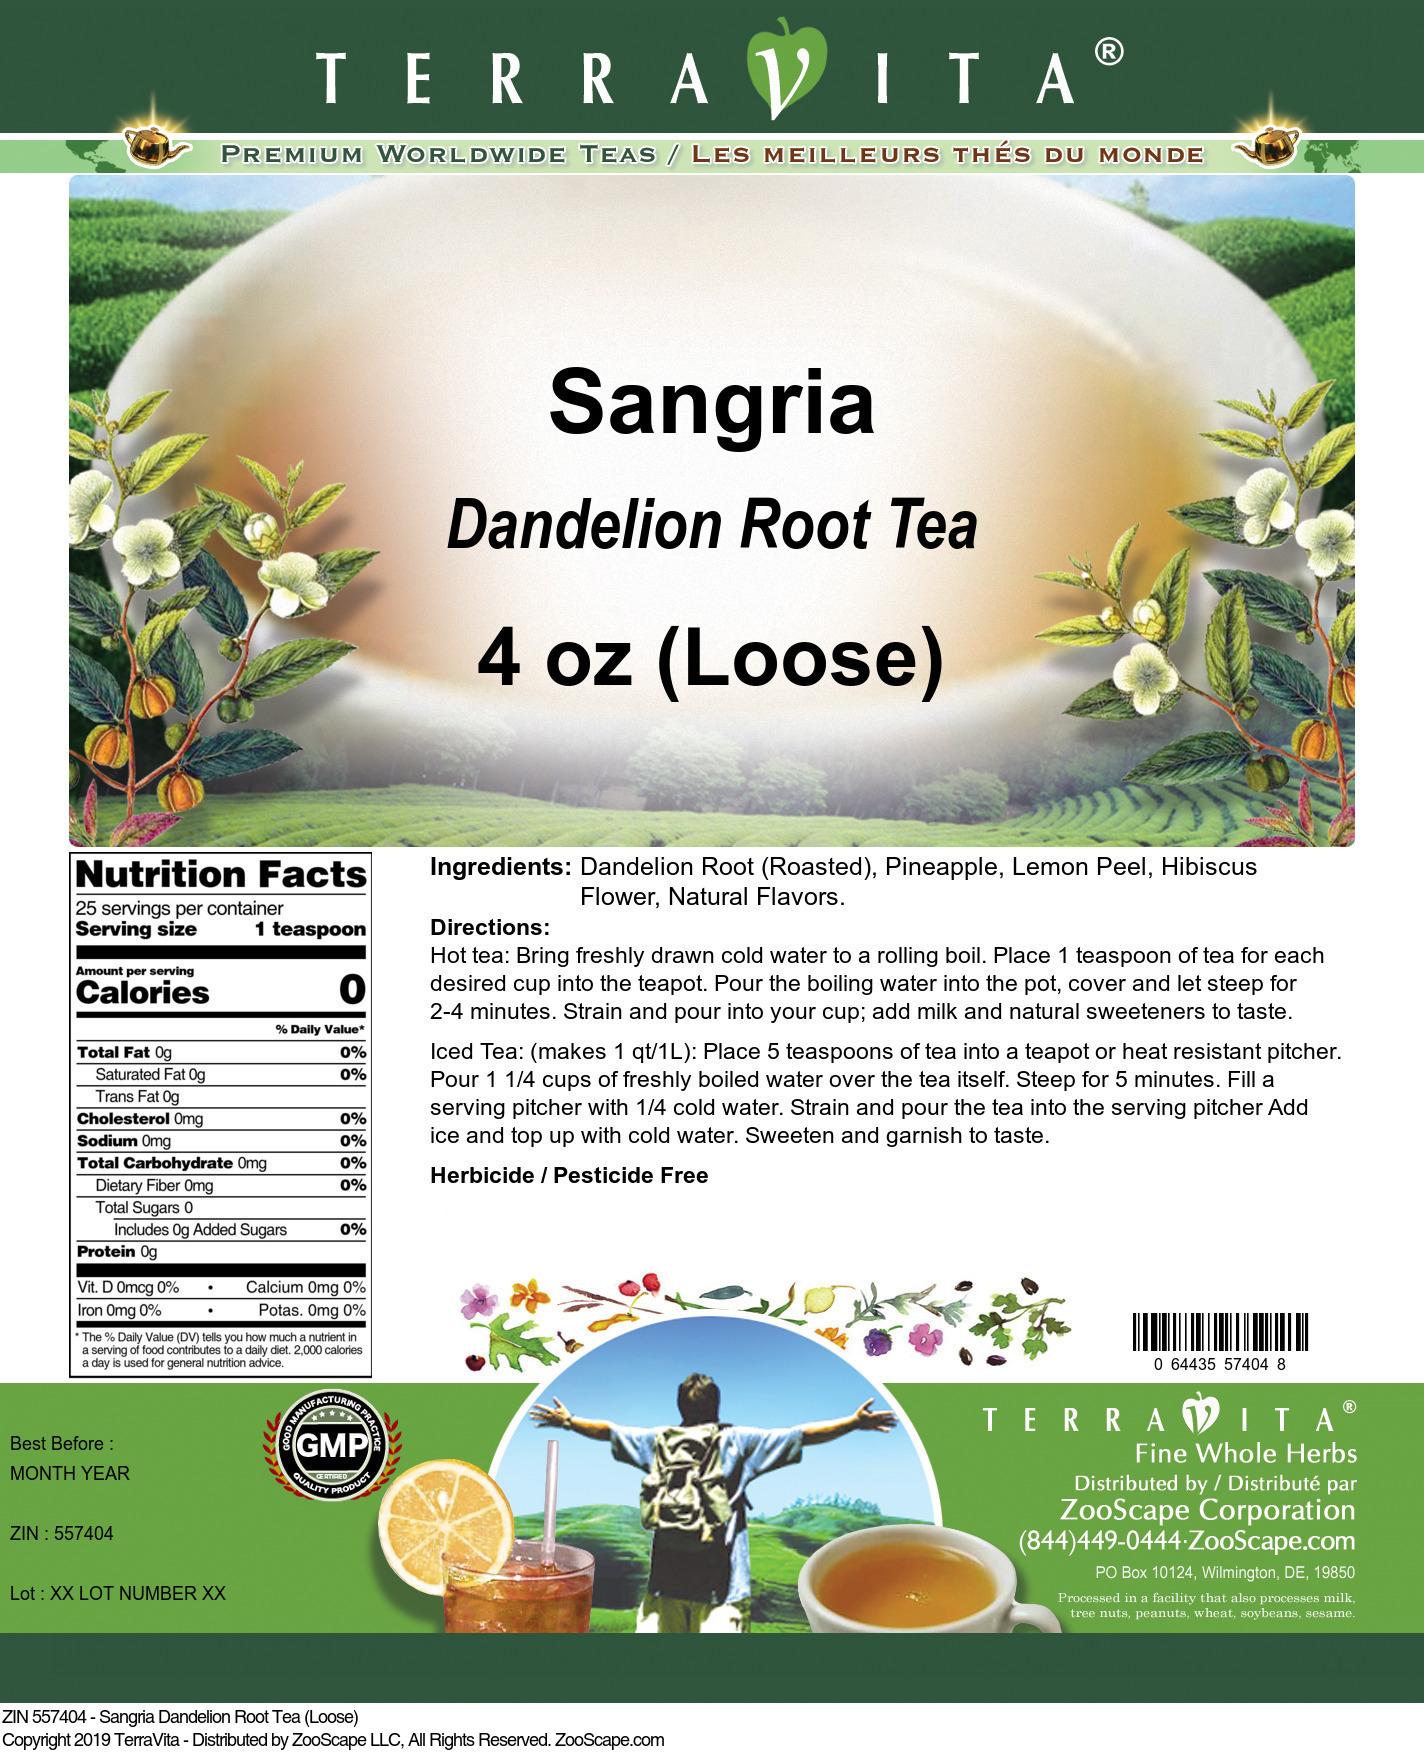 Sangria Dandelion Root Tea (Loose)